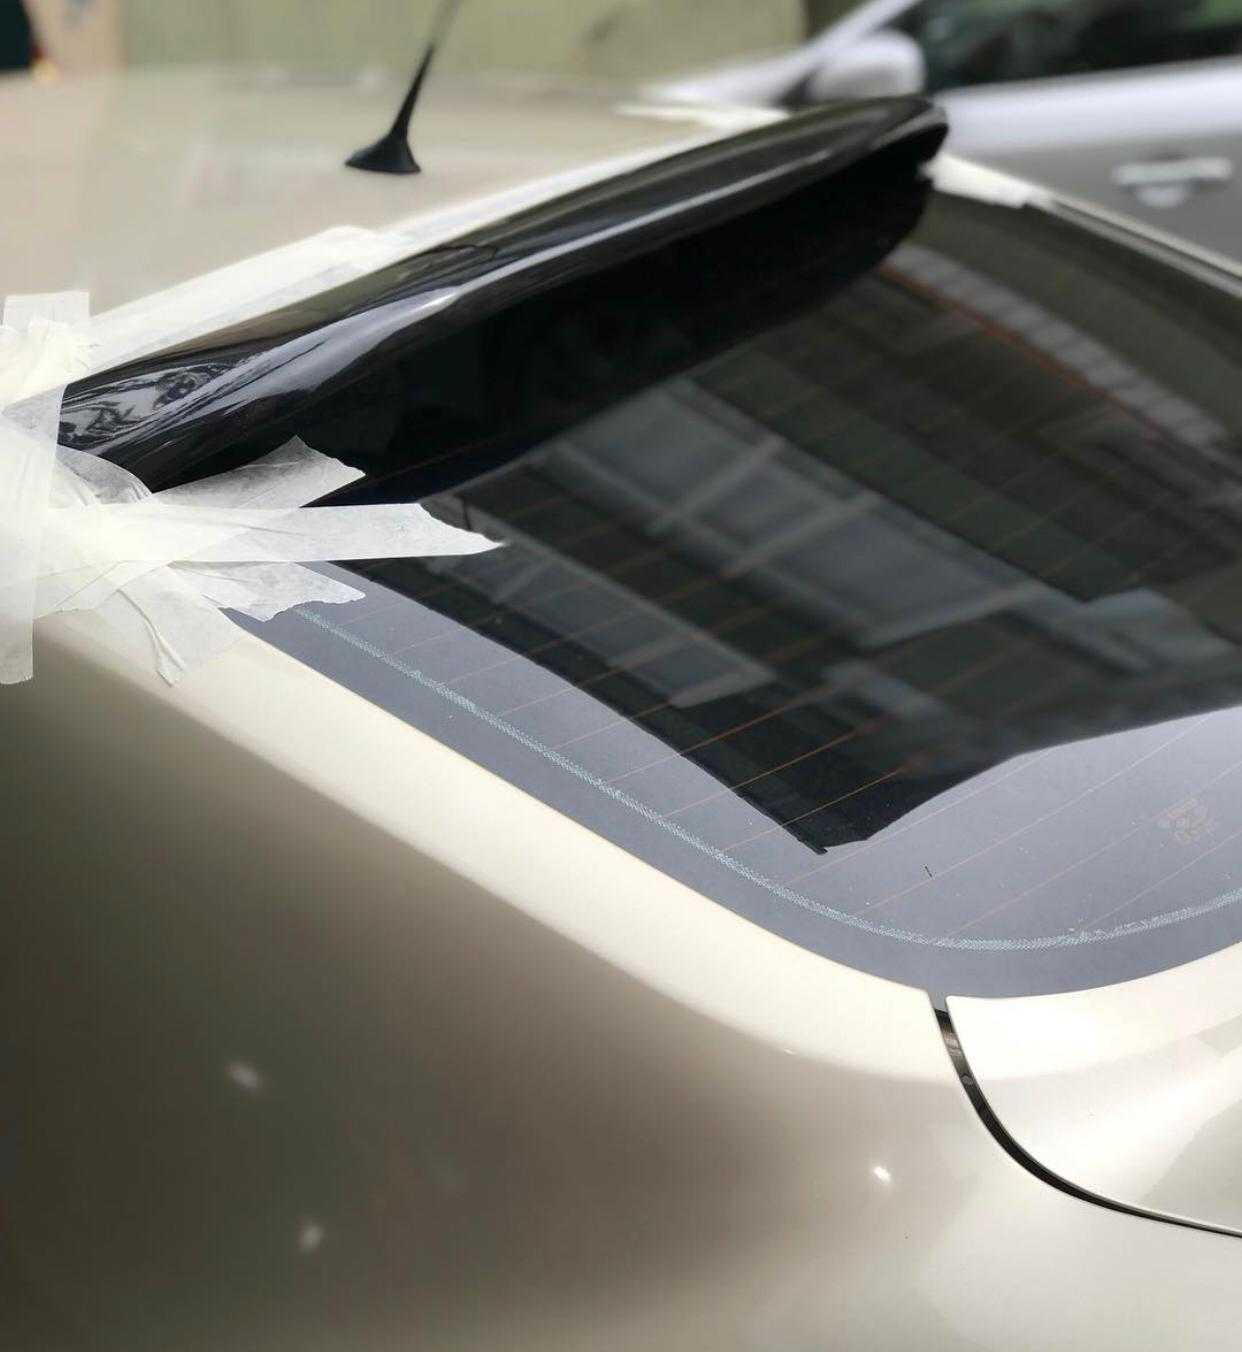 Renault Megane 2 Sedan Cam Üstü Spoiler 2002 - 2012 Parlak Siyah